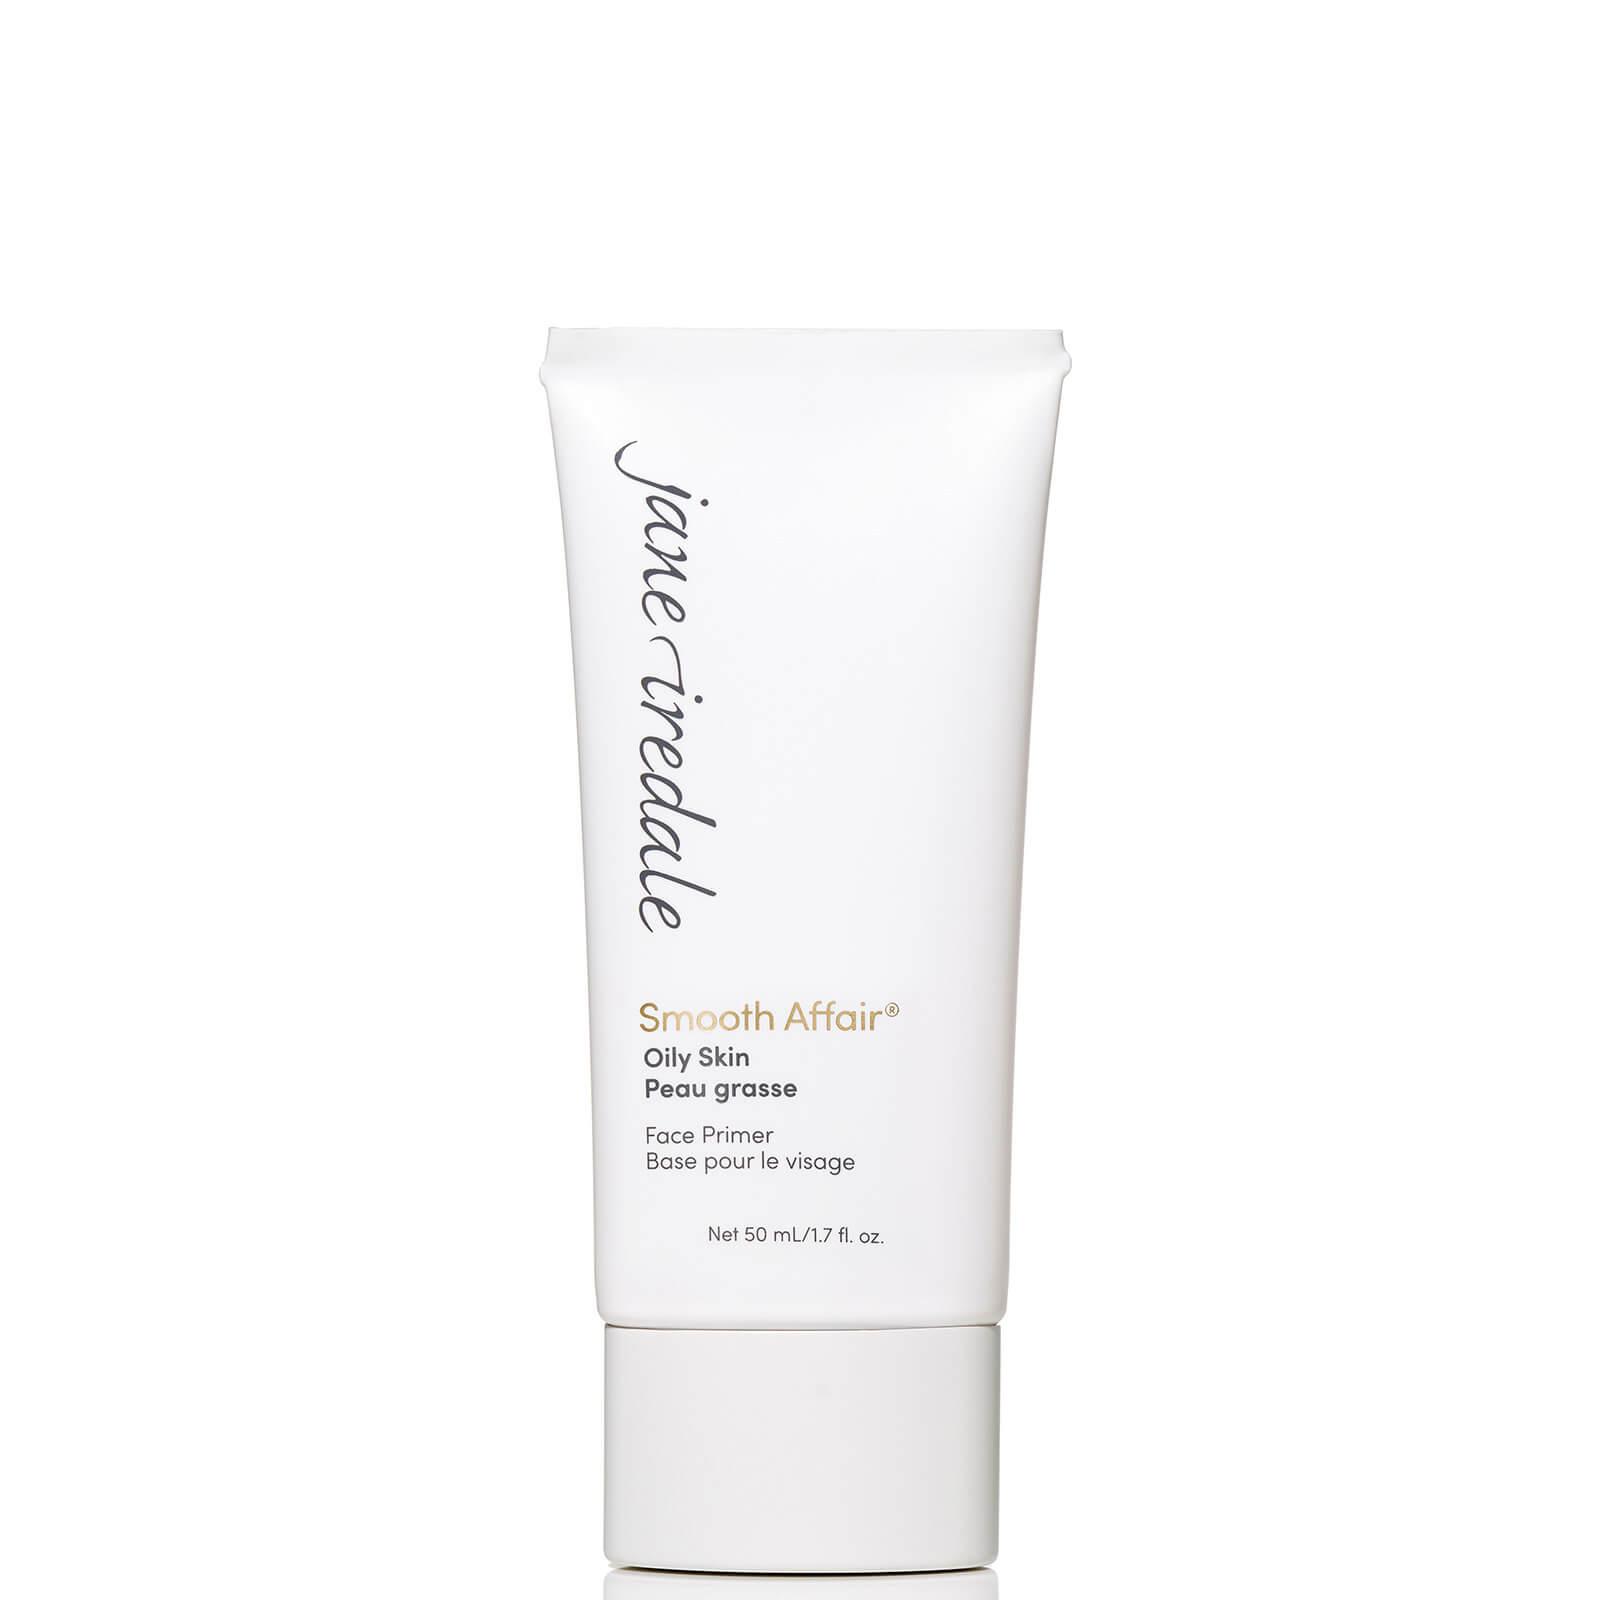 Jane Iredale Smooth Affair For Oily Skin Facial Primer Brightener (1.7 Fl. Oz.) In White